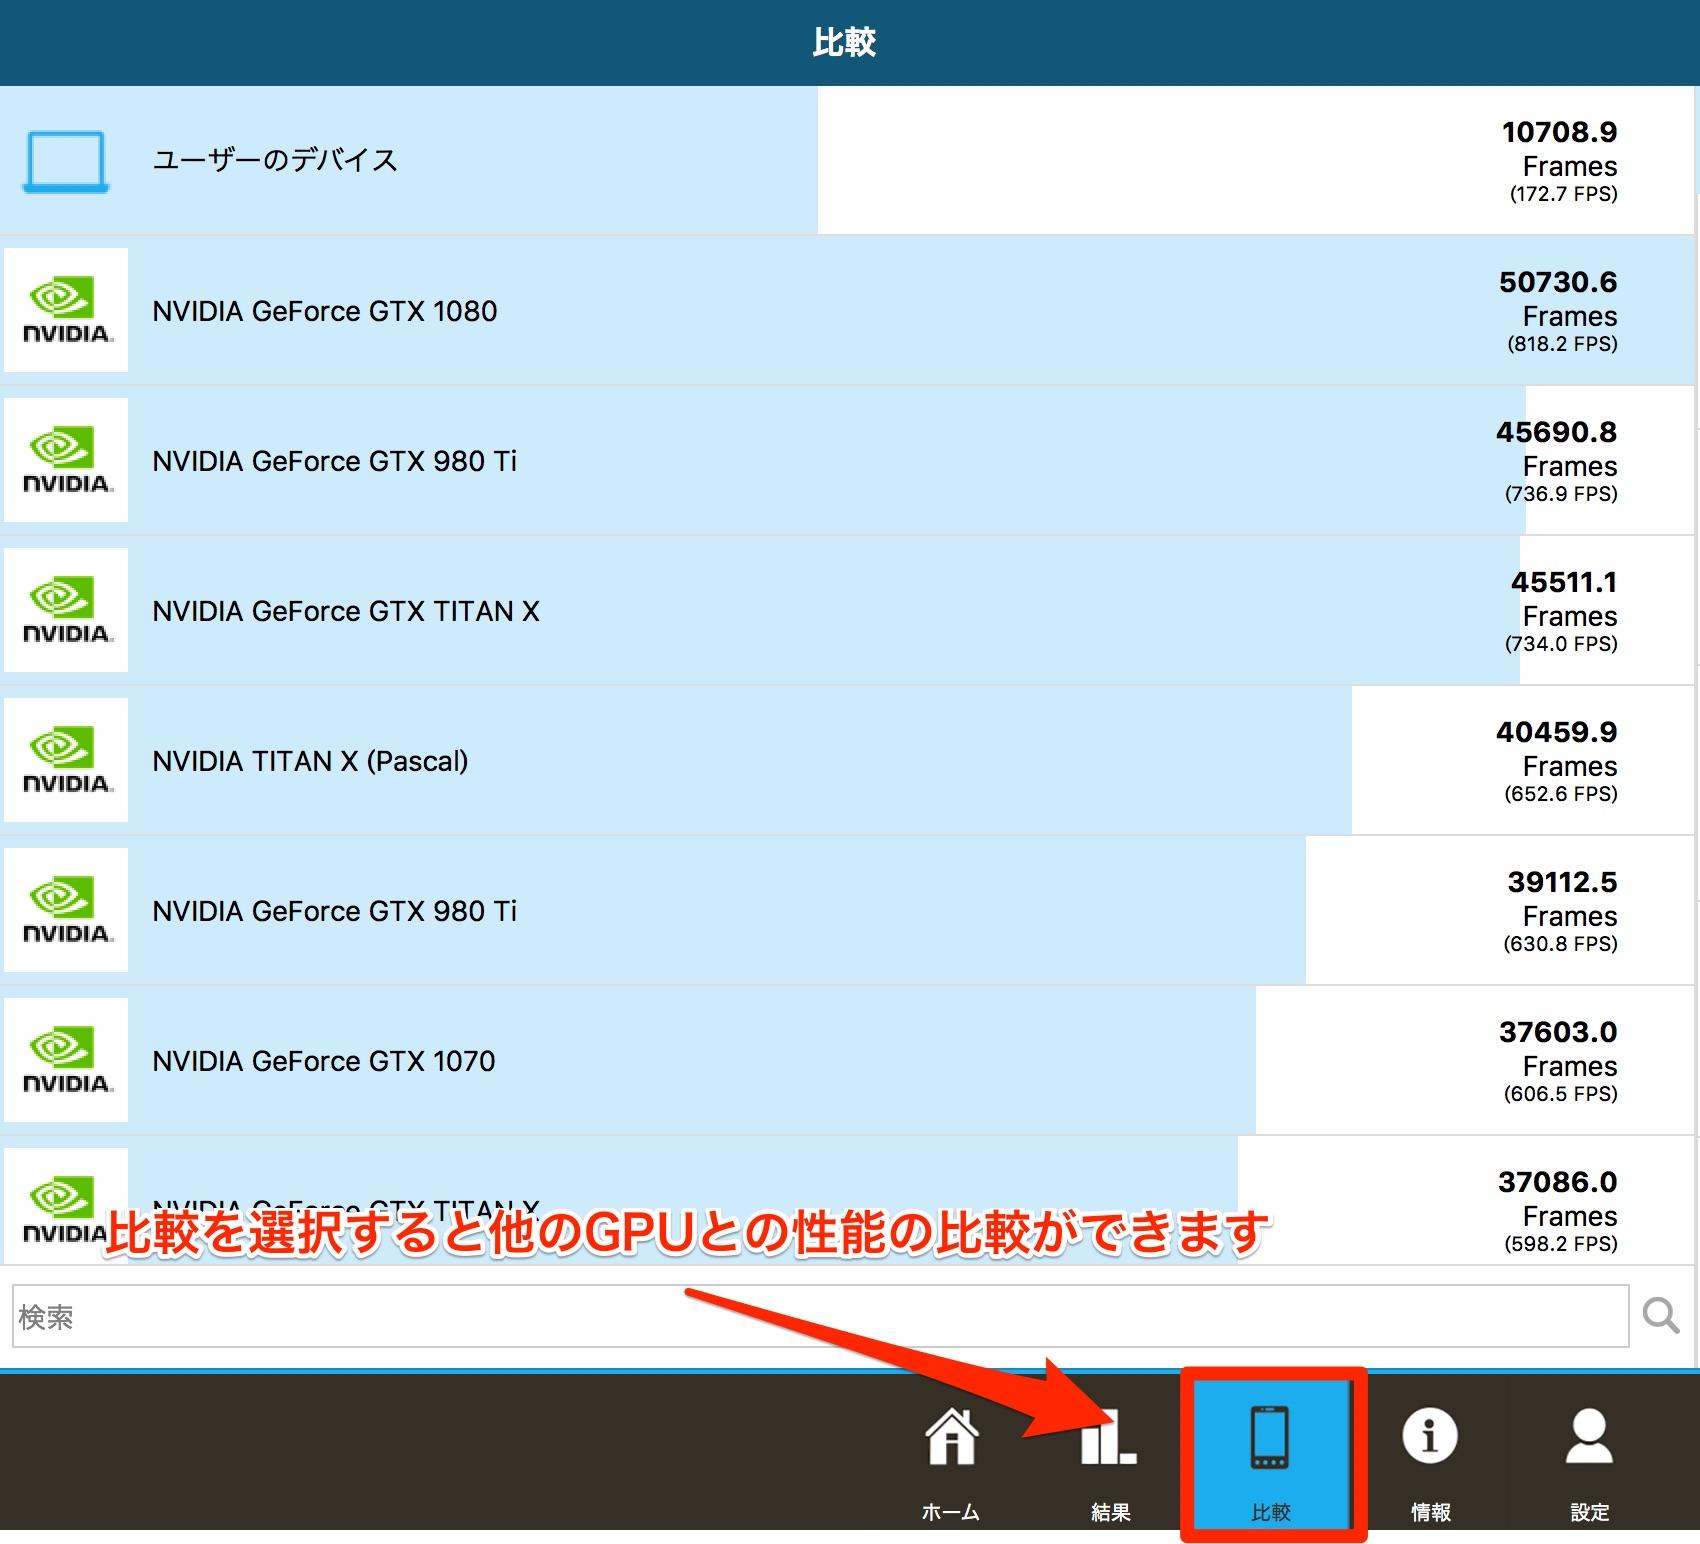 GFXBench Metal5 - iMac 4K Retina 21.5インチで様々なベンチマークテストを行なってみました